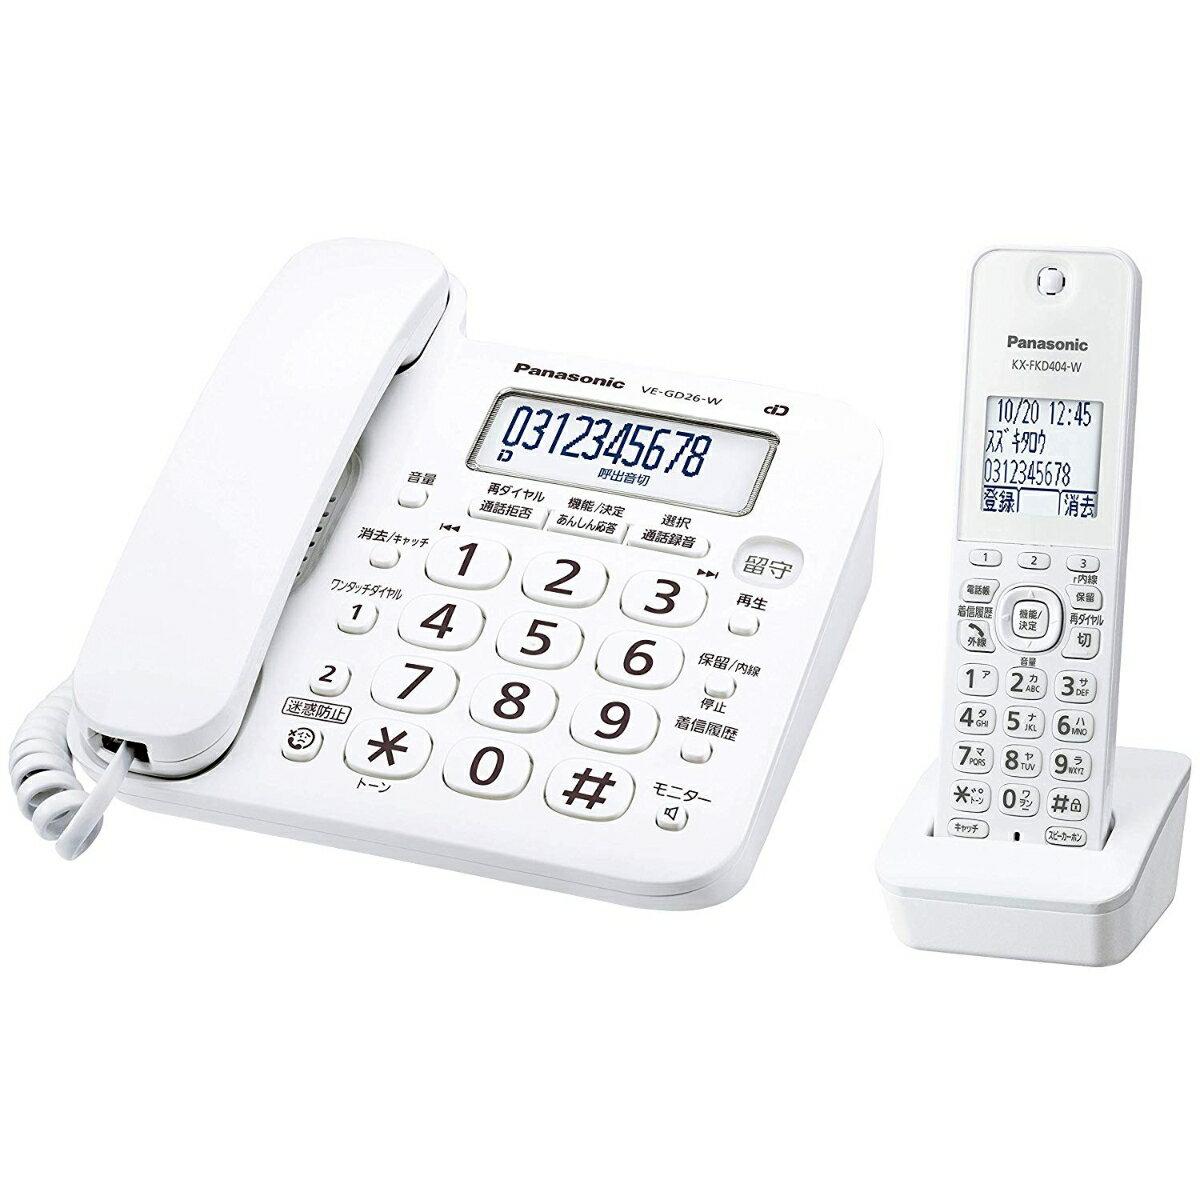 Panasonic コードレス電話機(子機1台付き)(ホワイト) VE-GD26DL-W